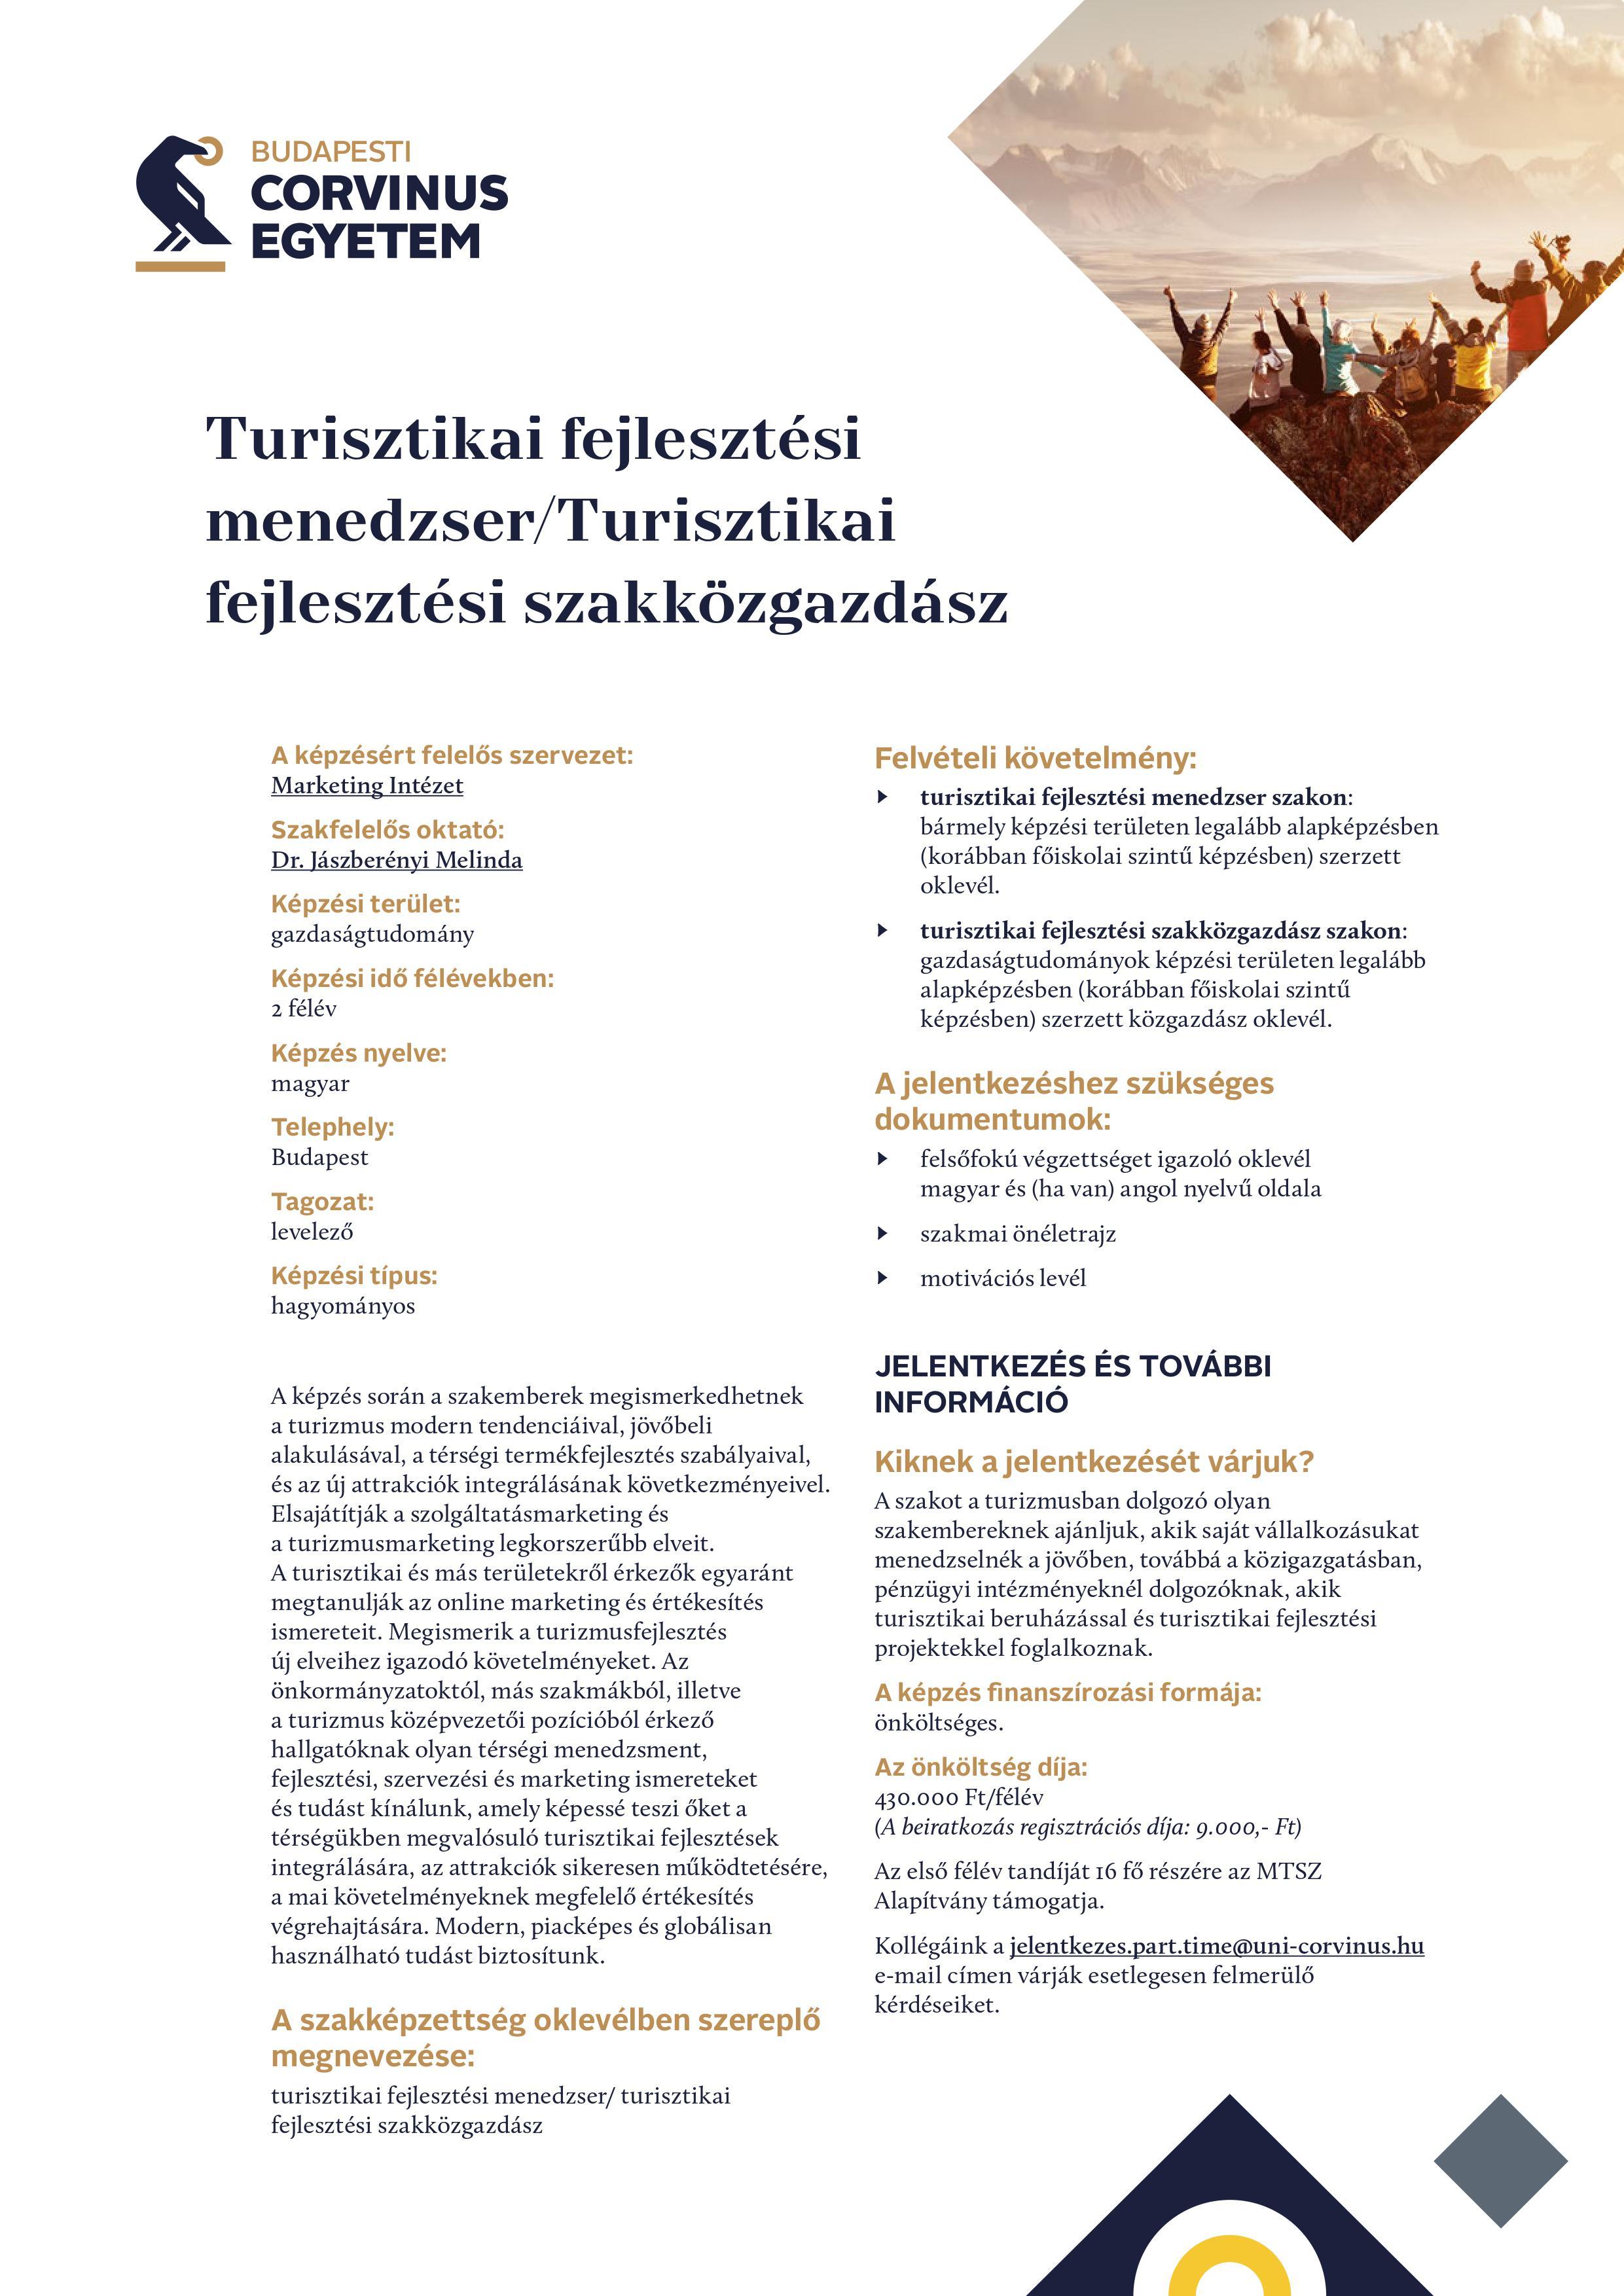 Turisztikai fejlesztési menedzser - Corvinus